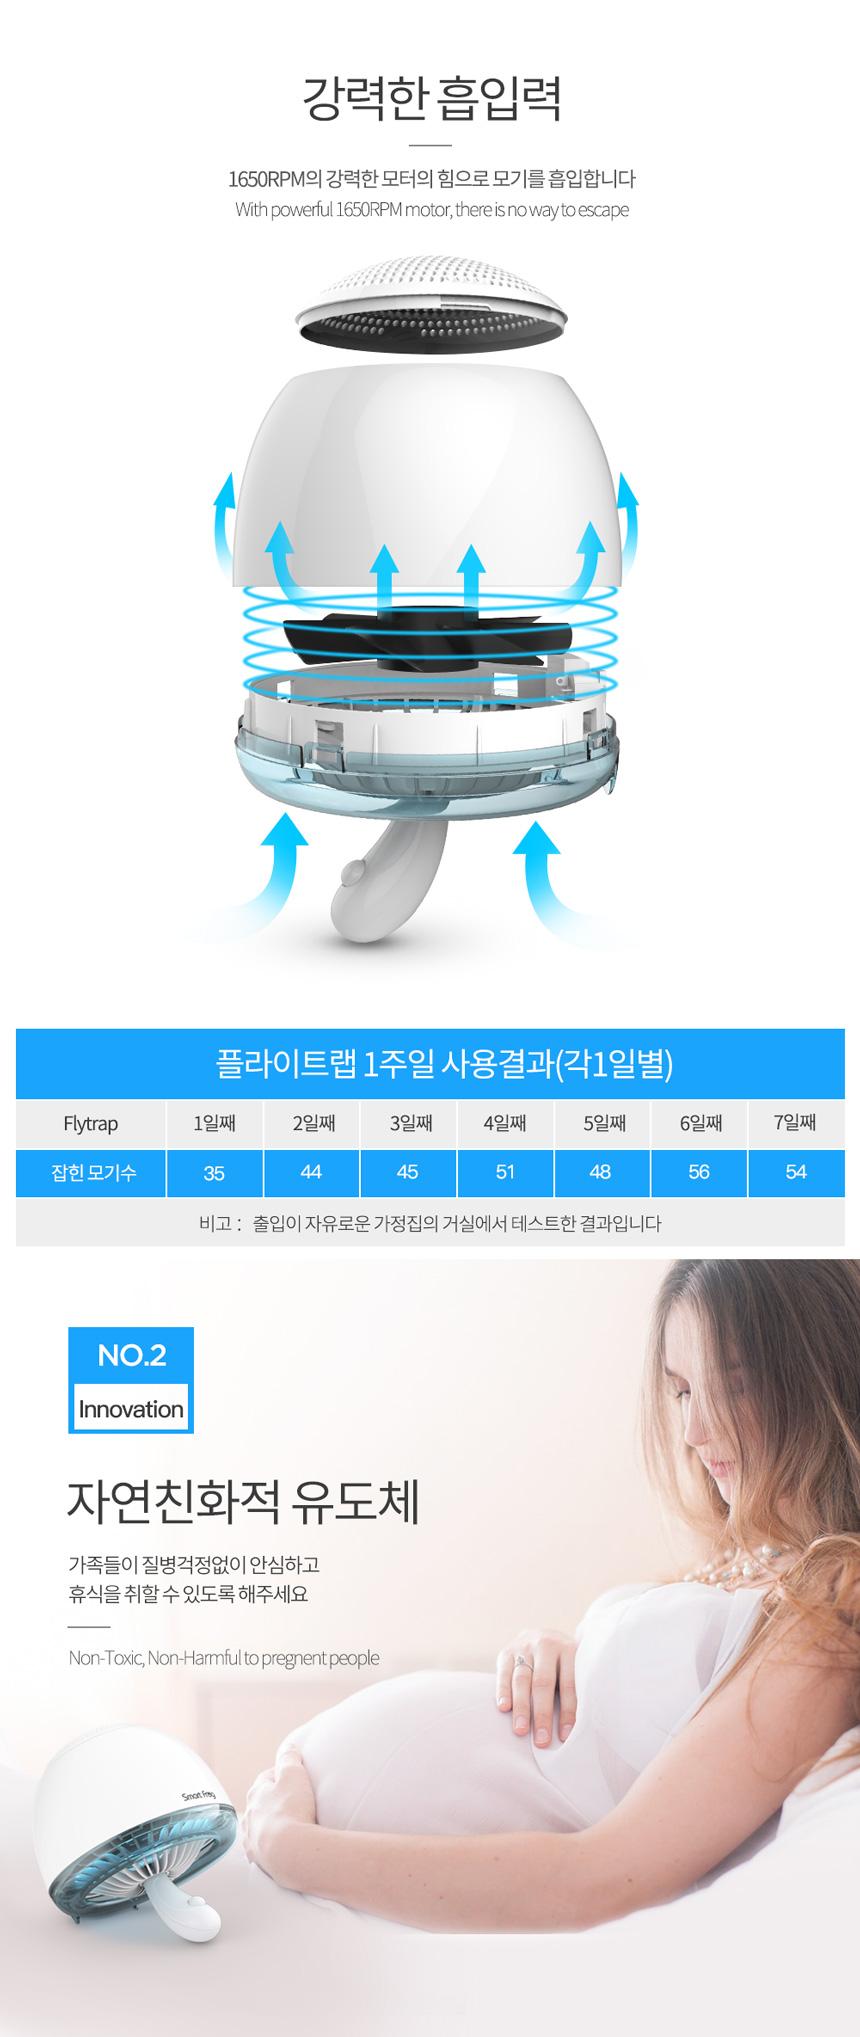 NEST네스트 모기퇴치기-플라이트랩+해충퇴치+안전자연방식 - 네스트, 31,300원, 여름용품, 모기퇴치용품